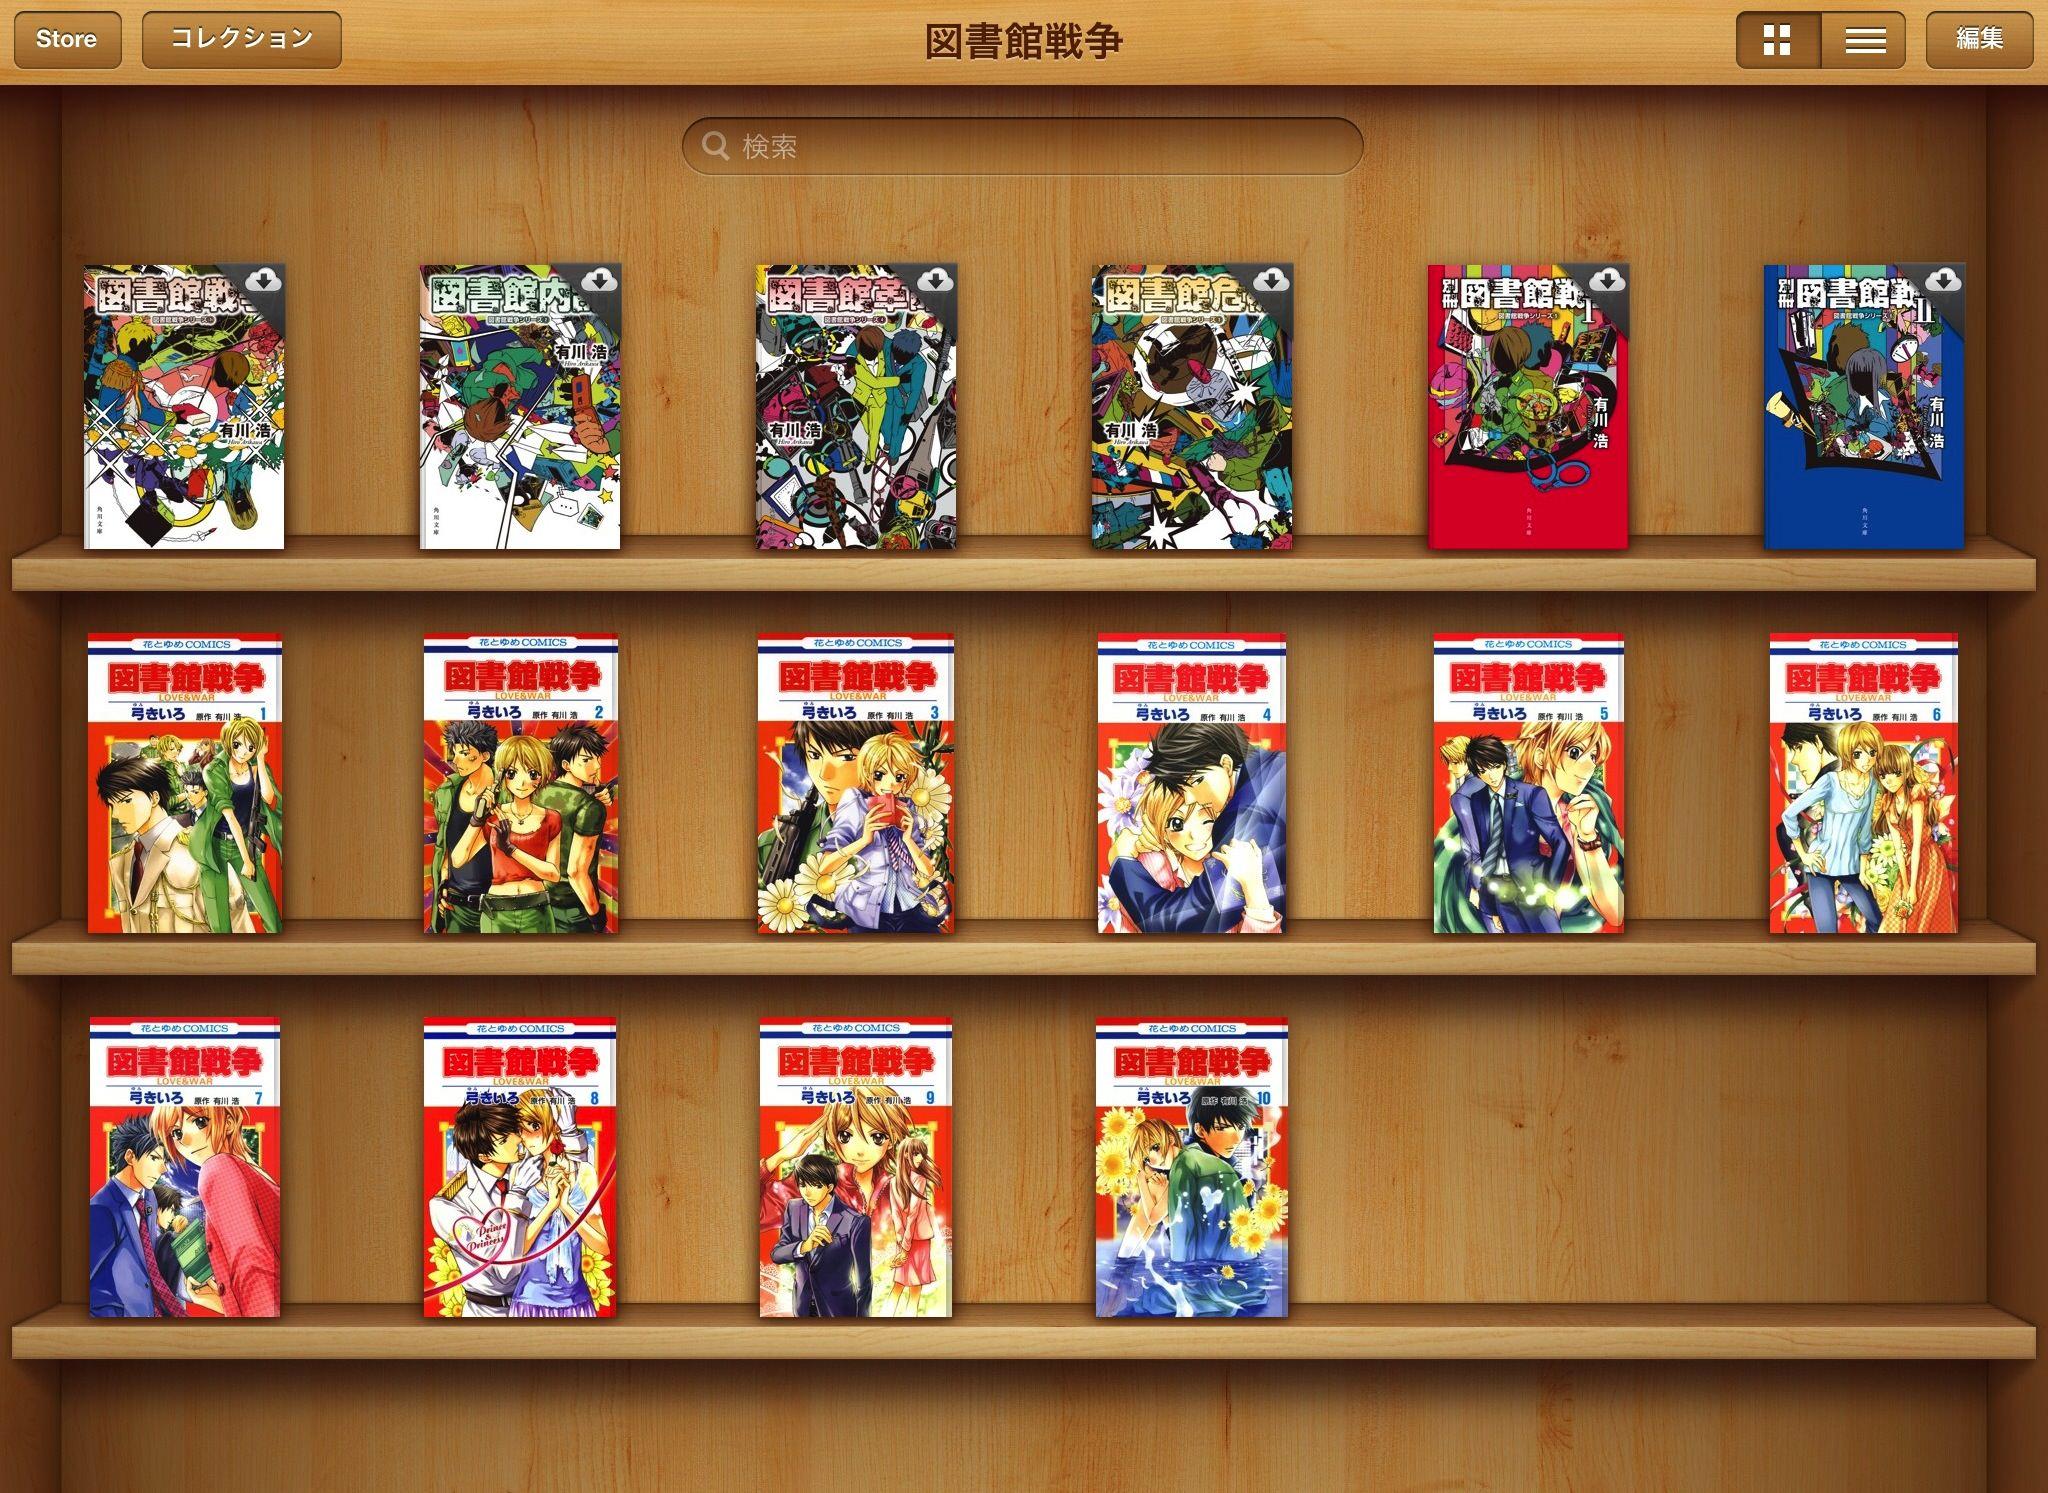 図書館戦争の本棚(漫画版)